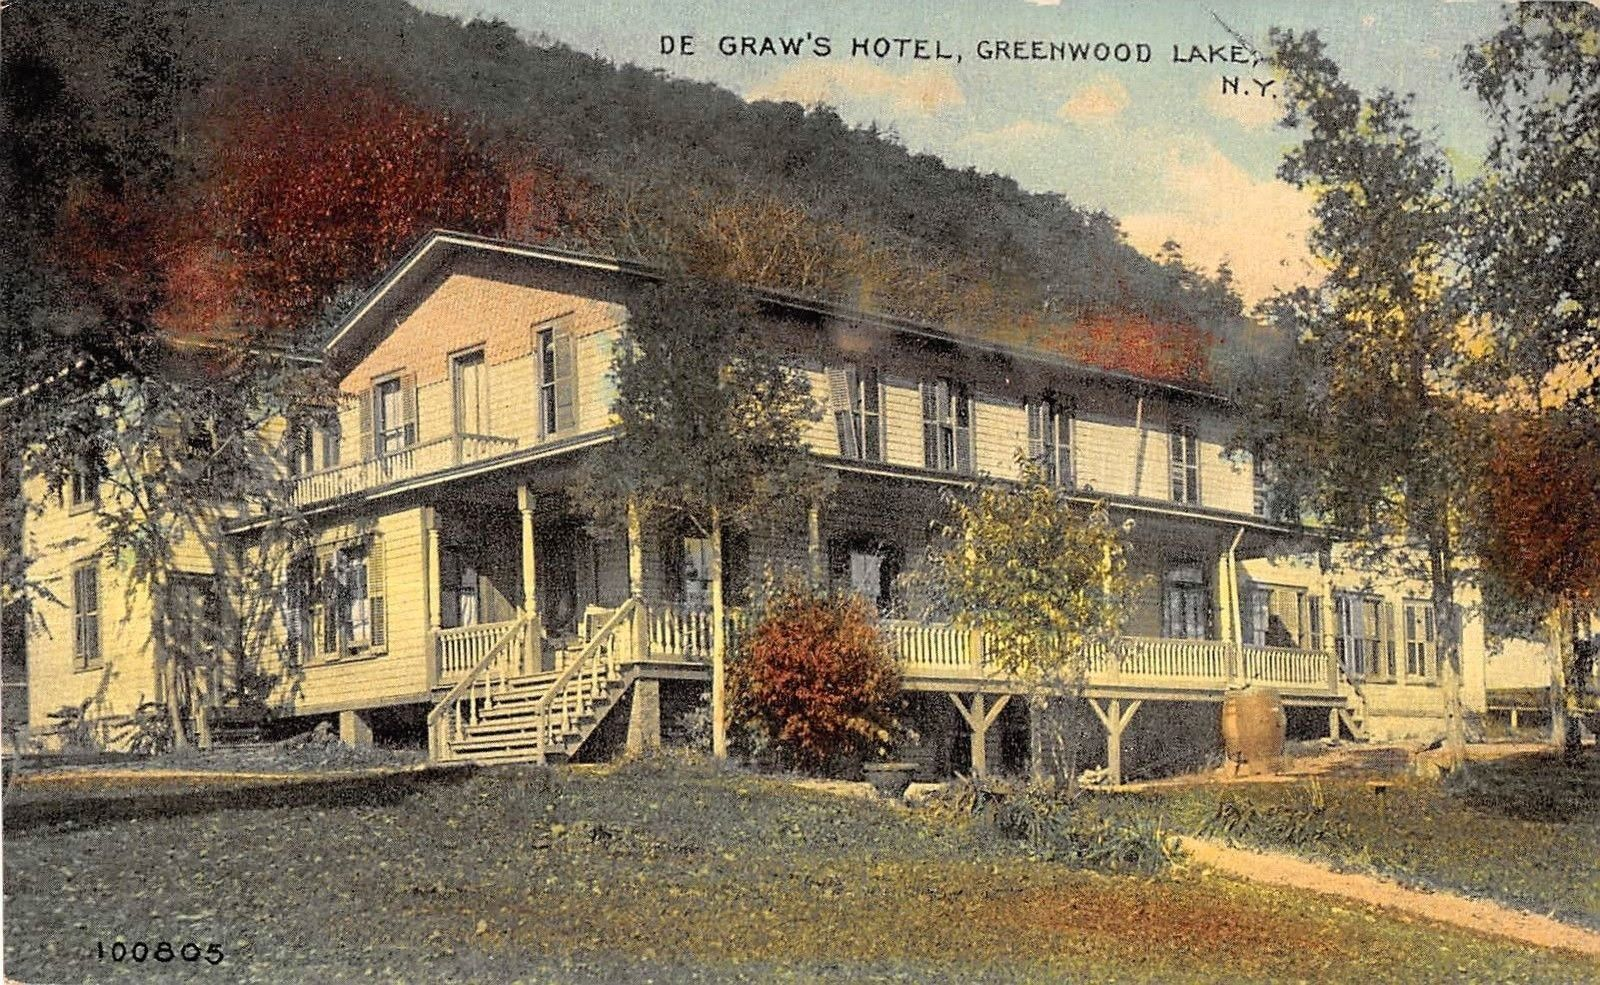 Images Of Warwick New York De Graw S Hotel Greenwood Lake Greenwood Lake Greenwood Lake